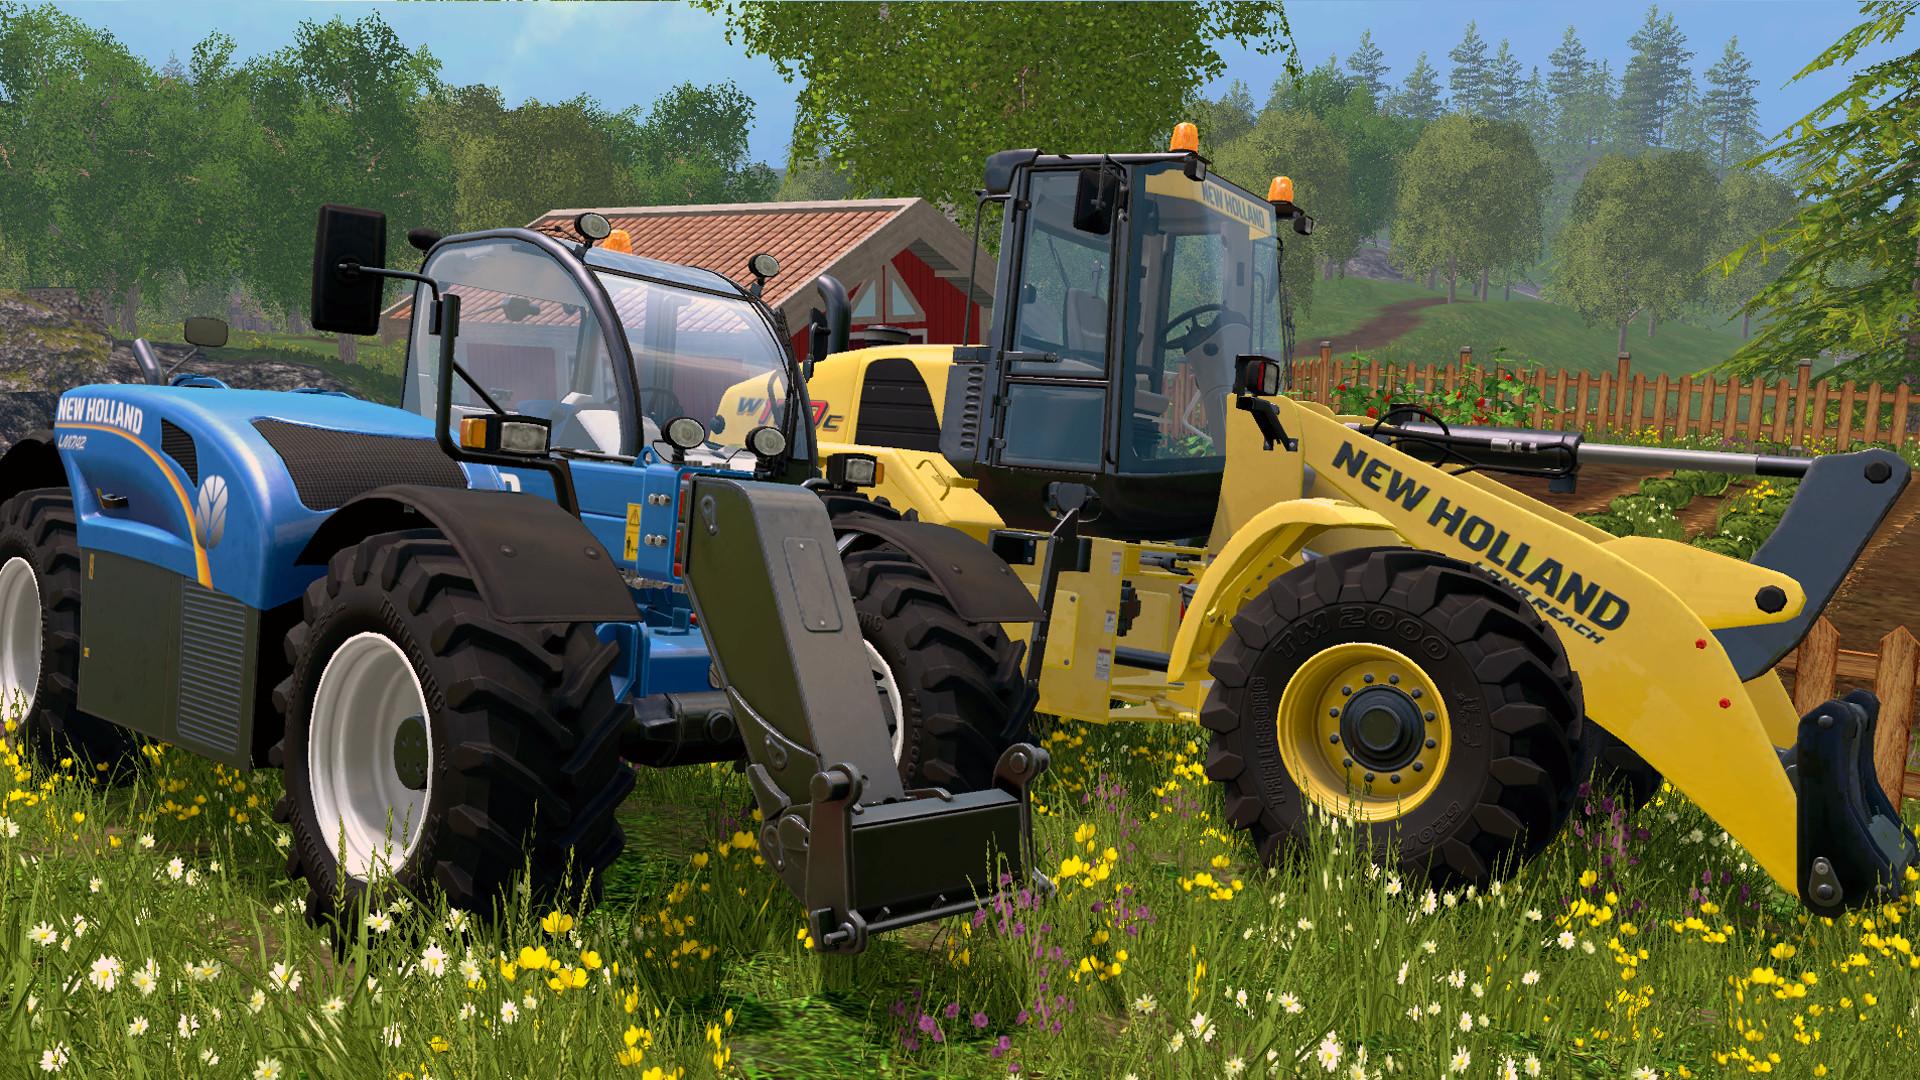 Farming Simulator 15 - New Holland Loader Pack on Steam